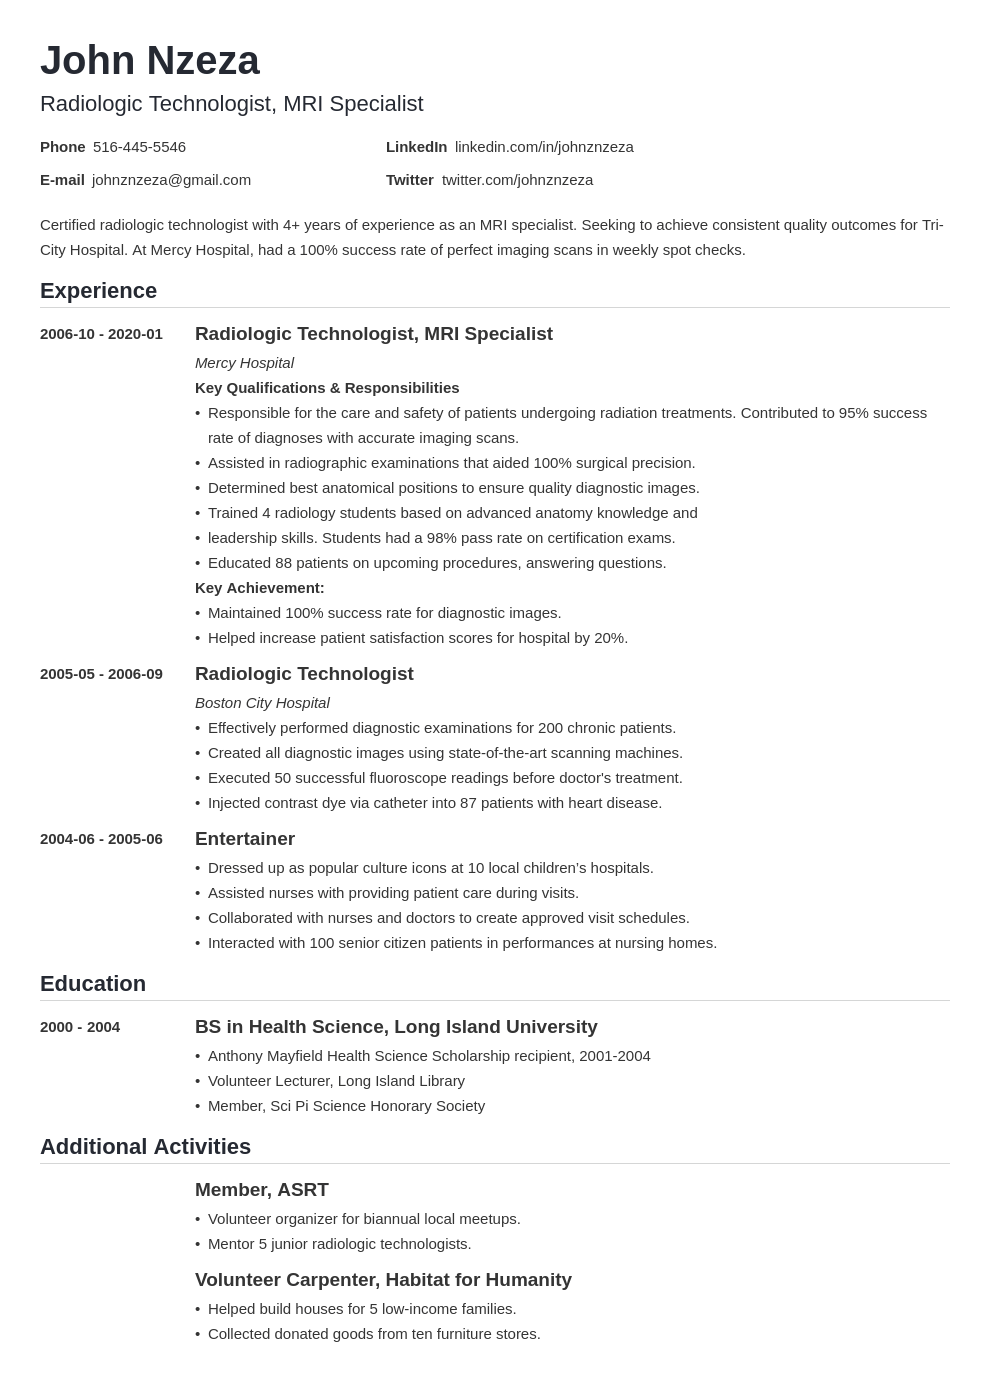 Resume for radiologic technologist student university editing service uk